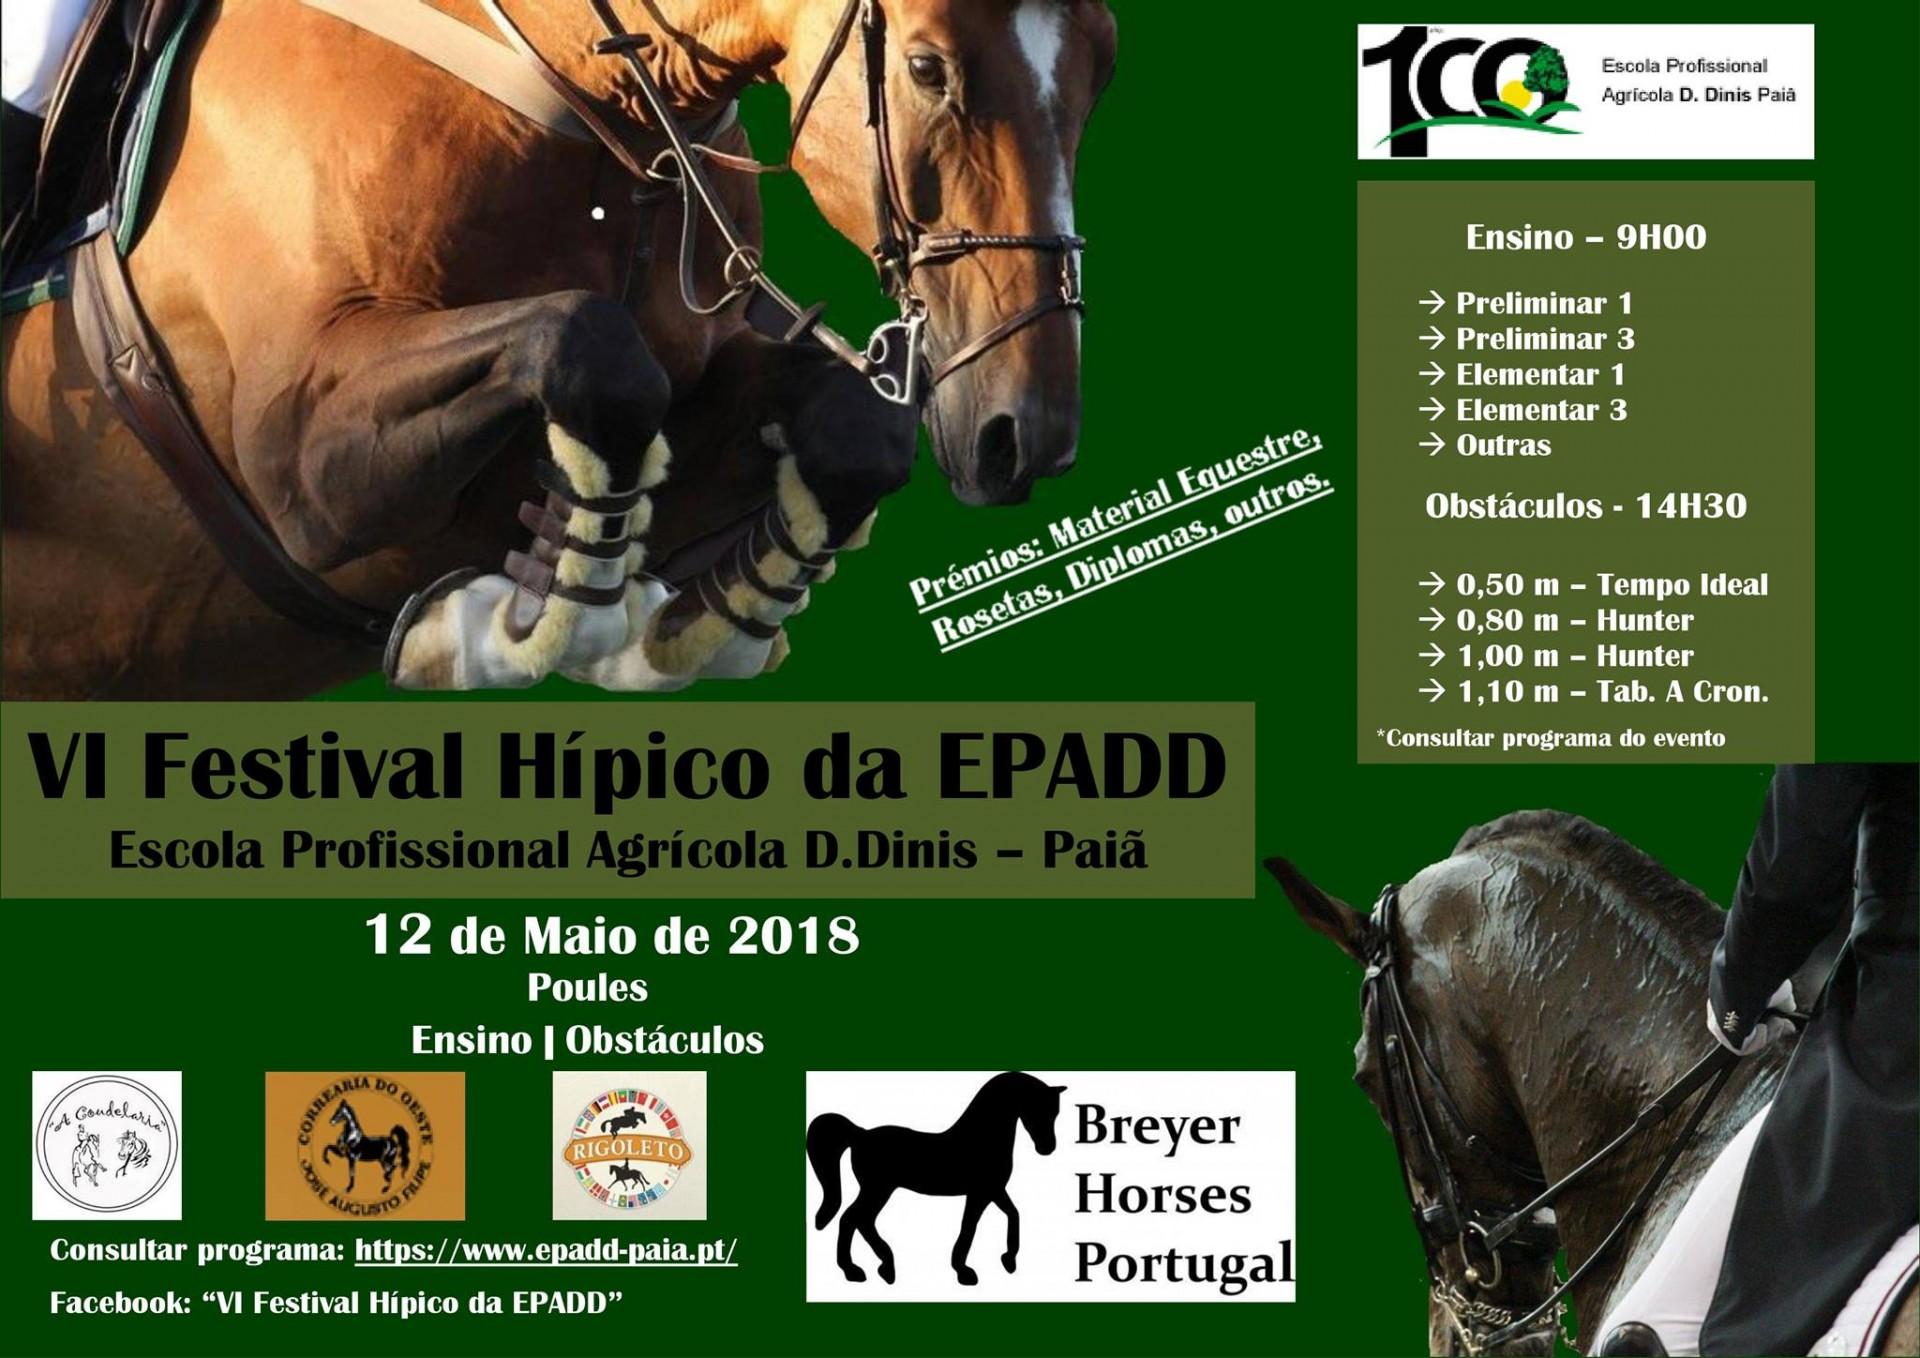 BHP Patrocina VI Festival Hípico da EPADD